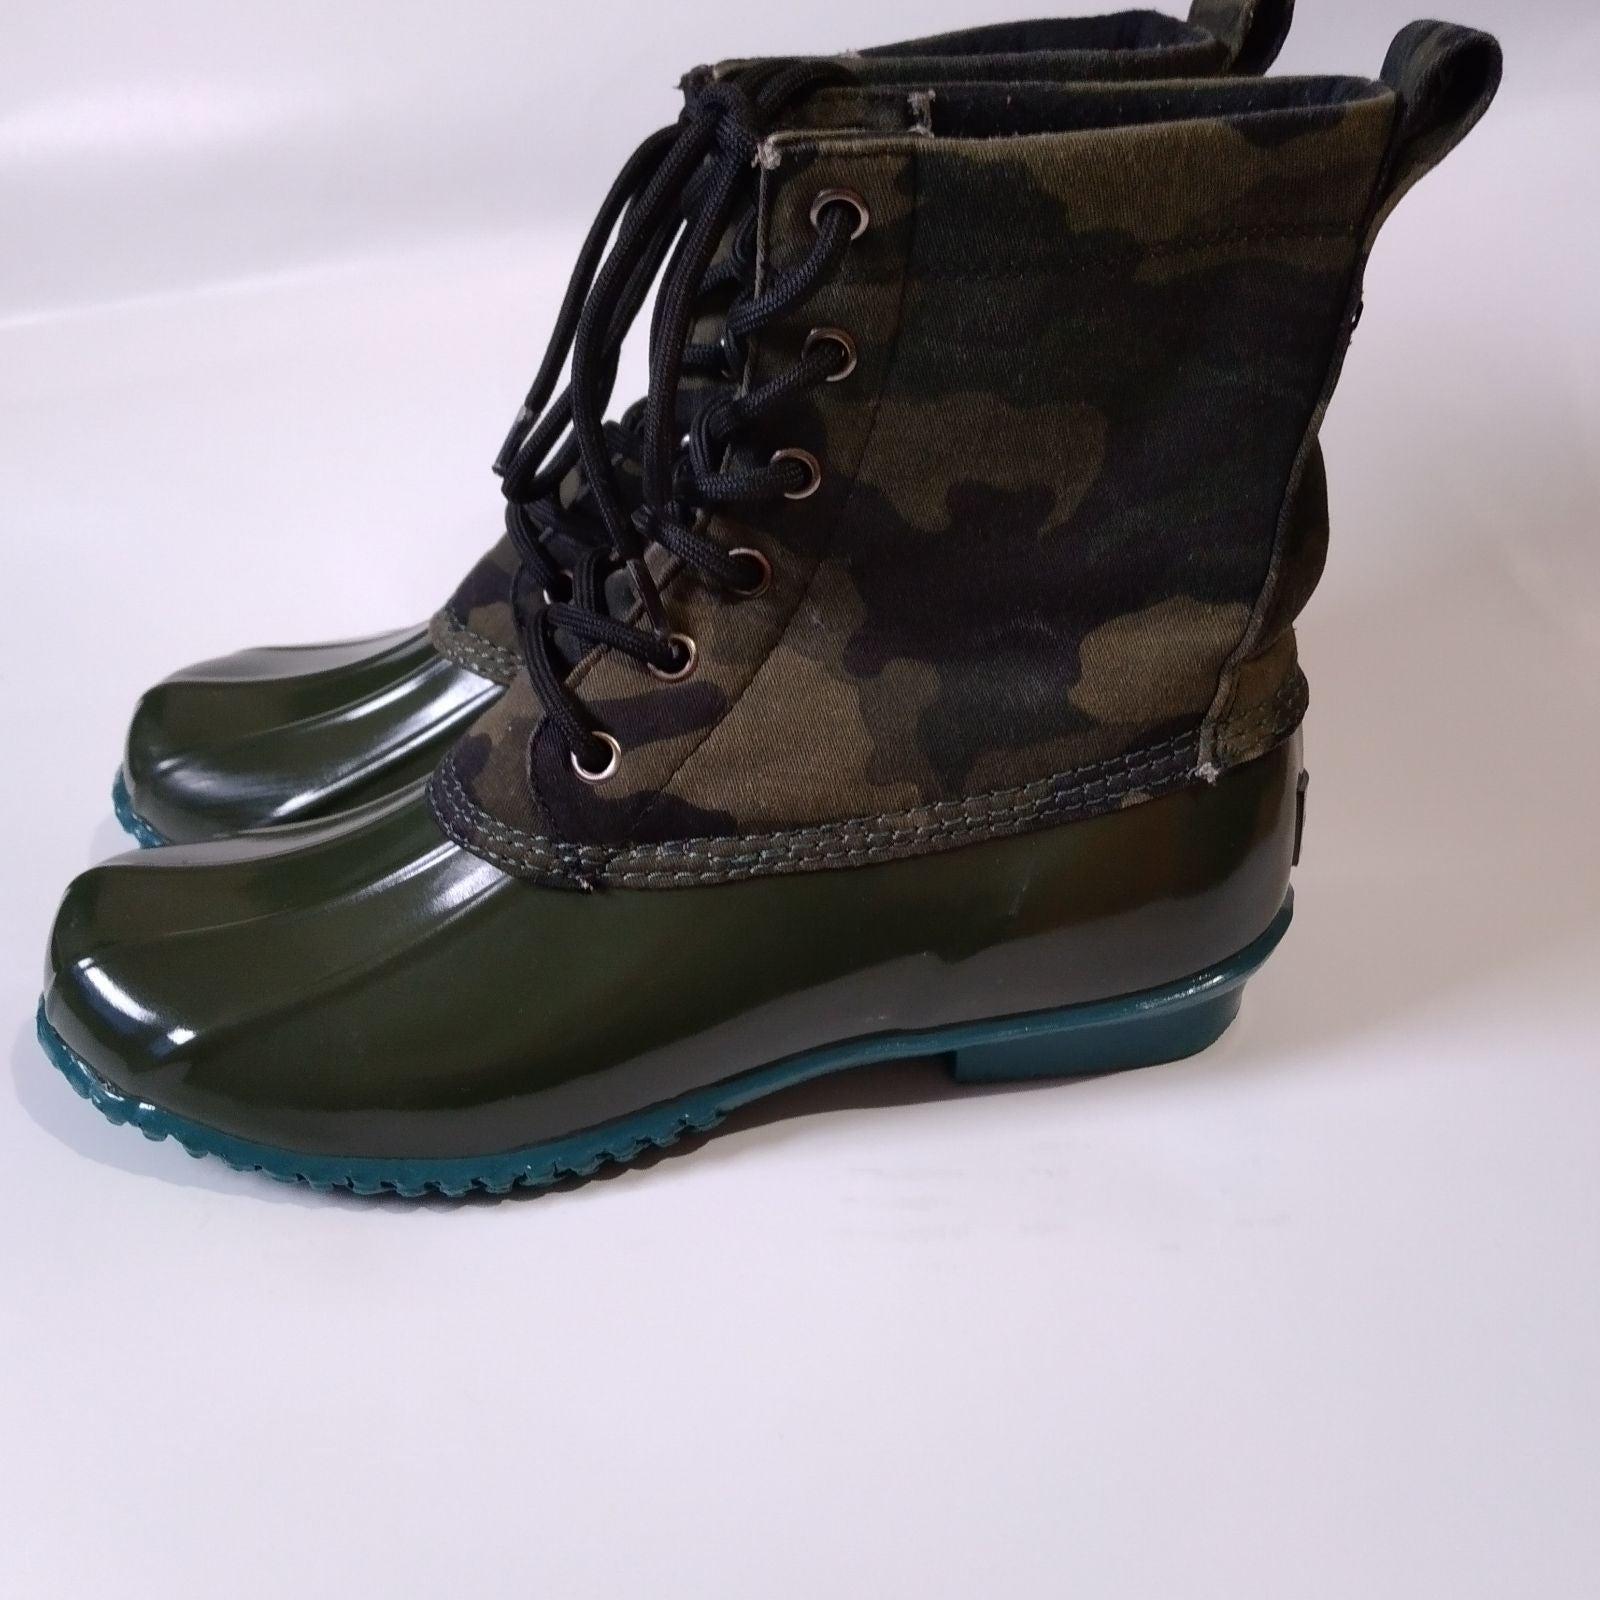 Bass harlequin womens duck boots size 8M